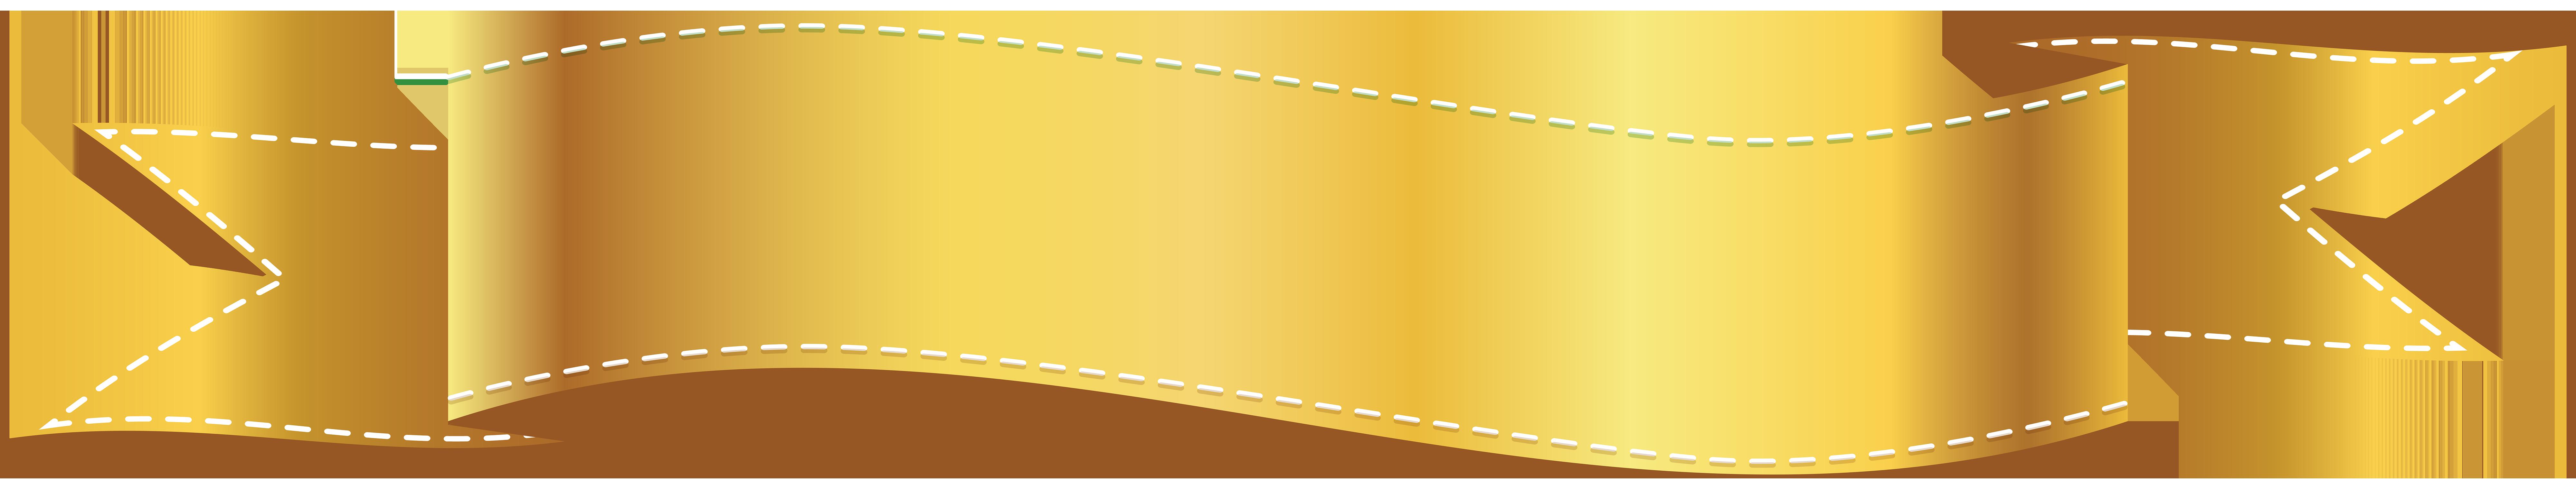 Golden label png imageub. Gold clipart clip art